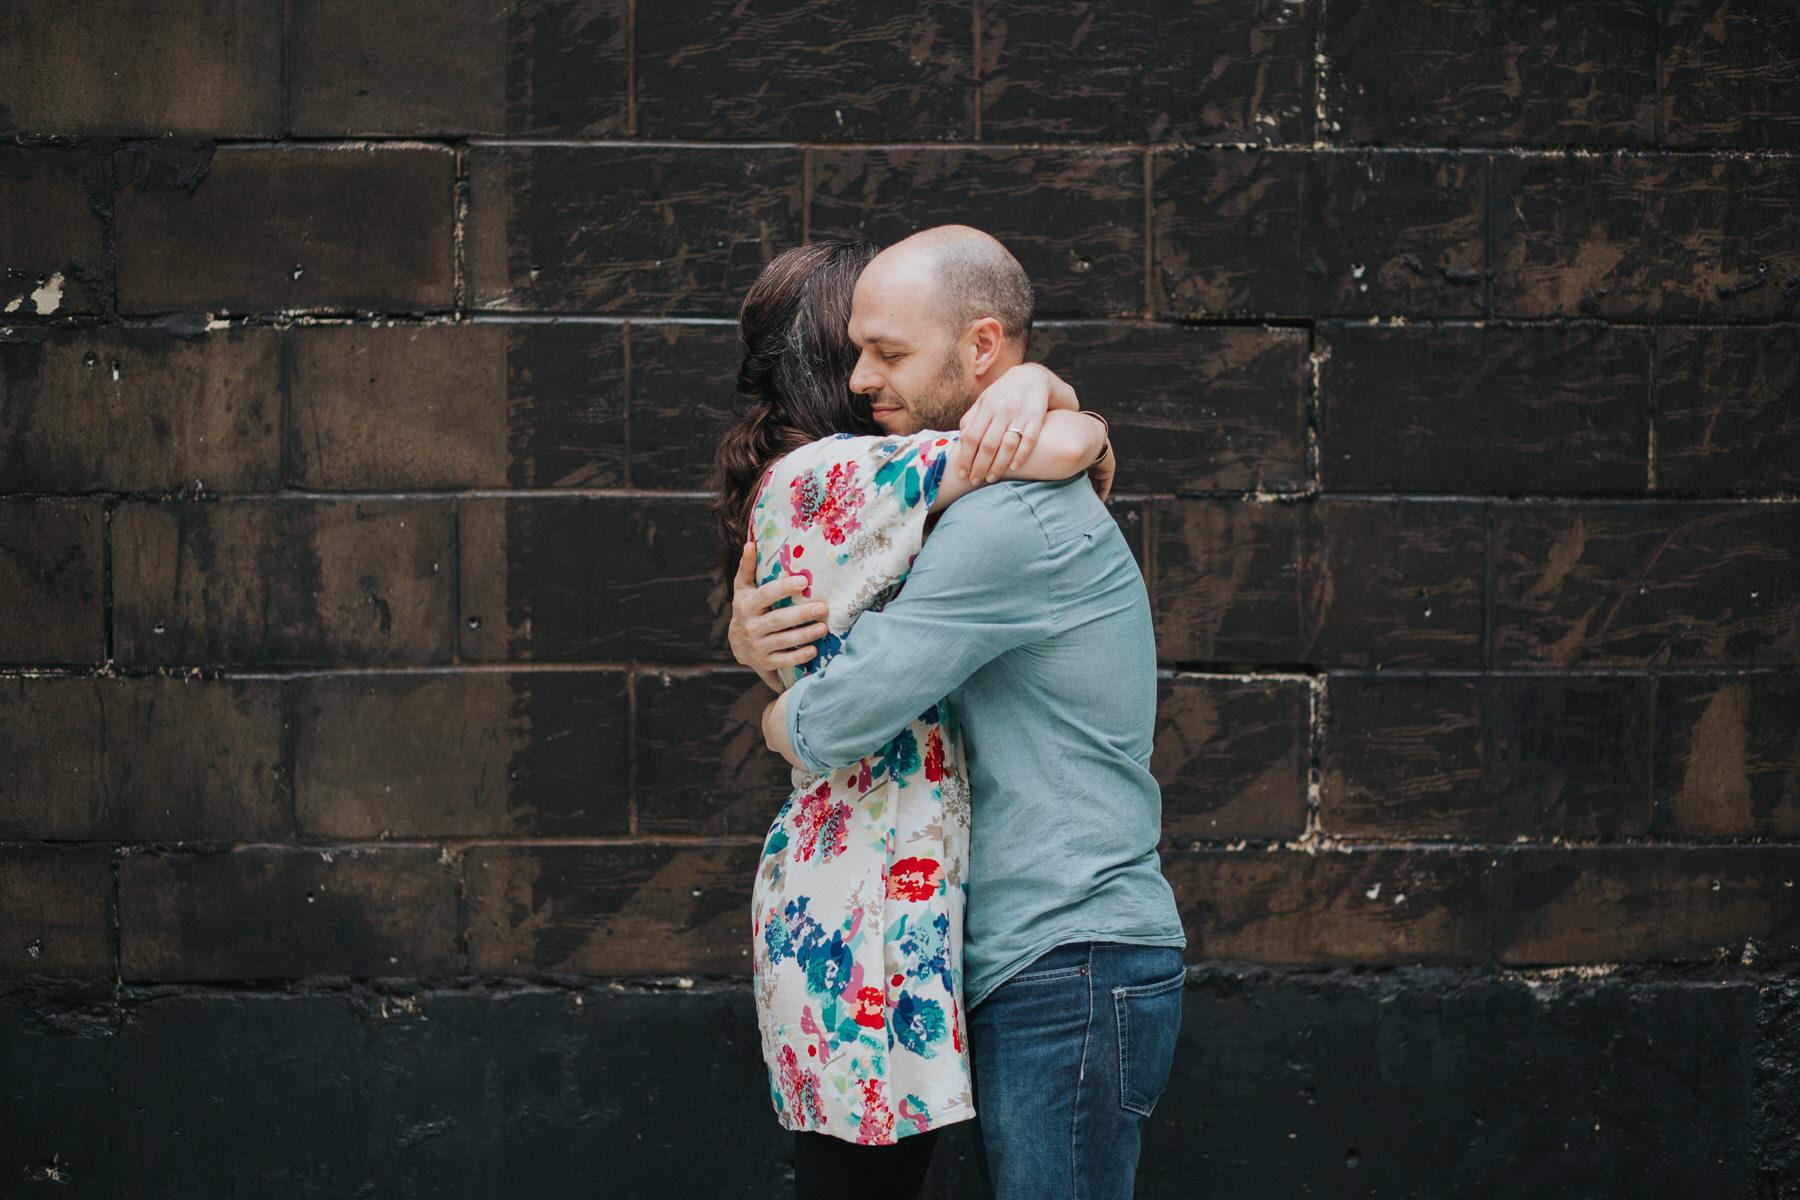 14-couple cuddling against urban background London.jpg